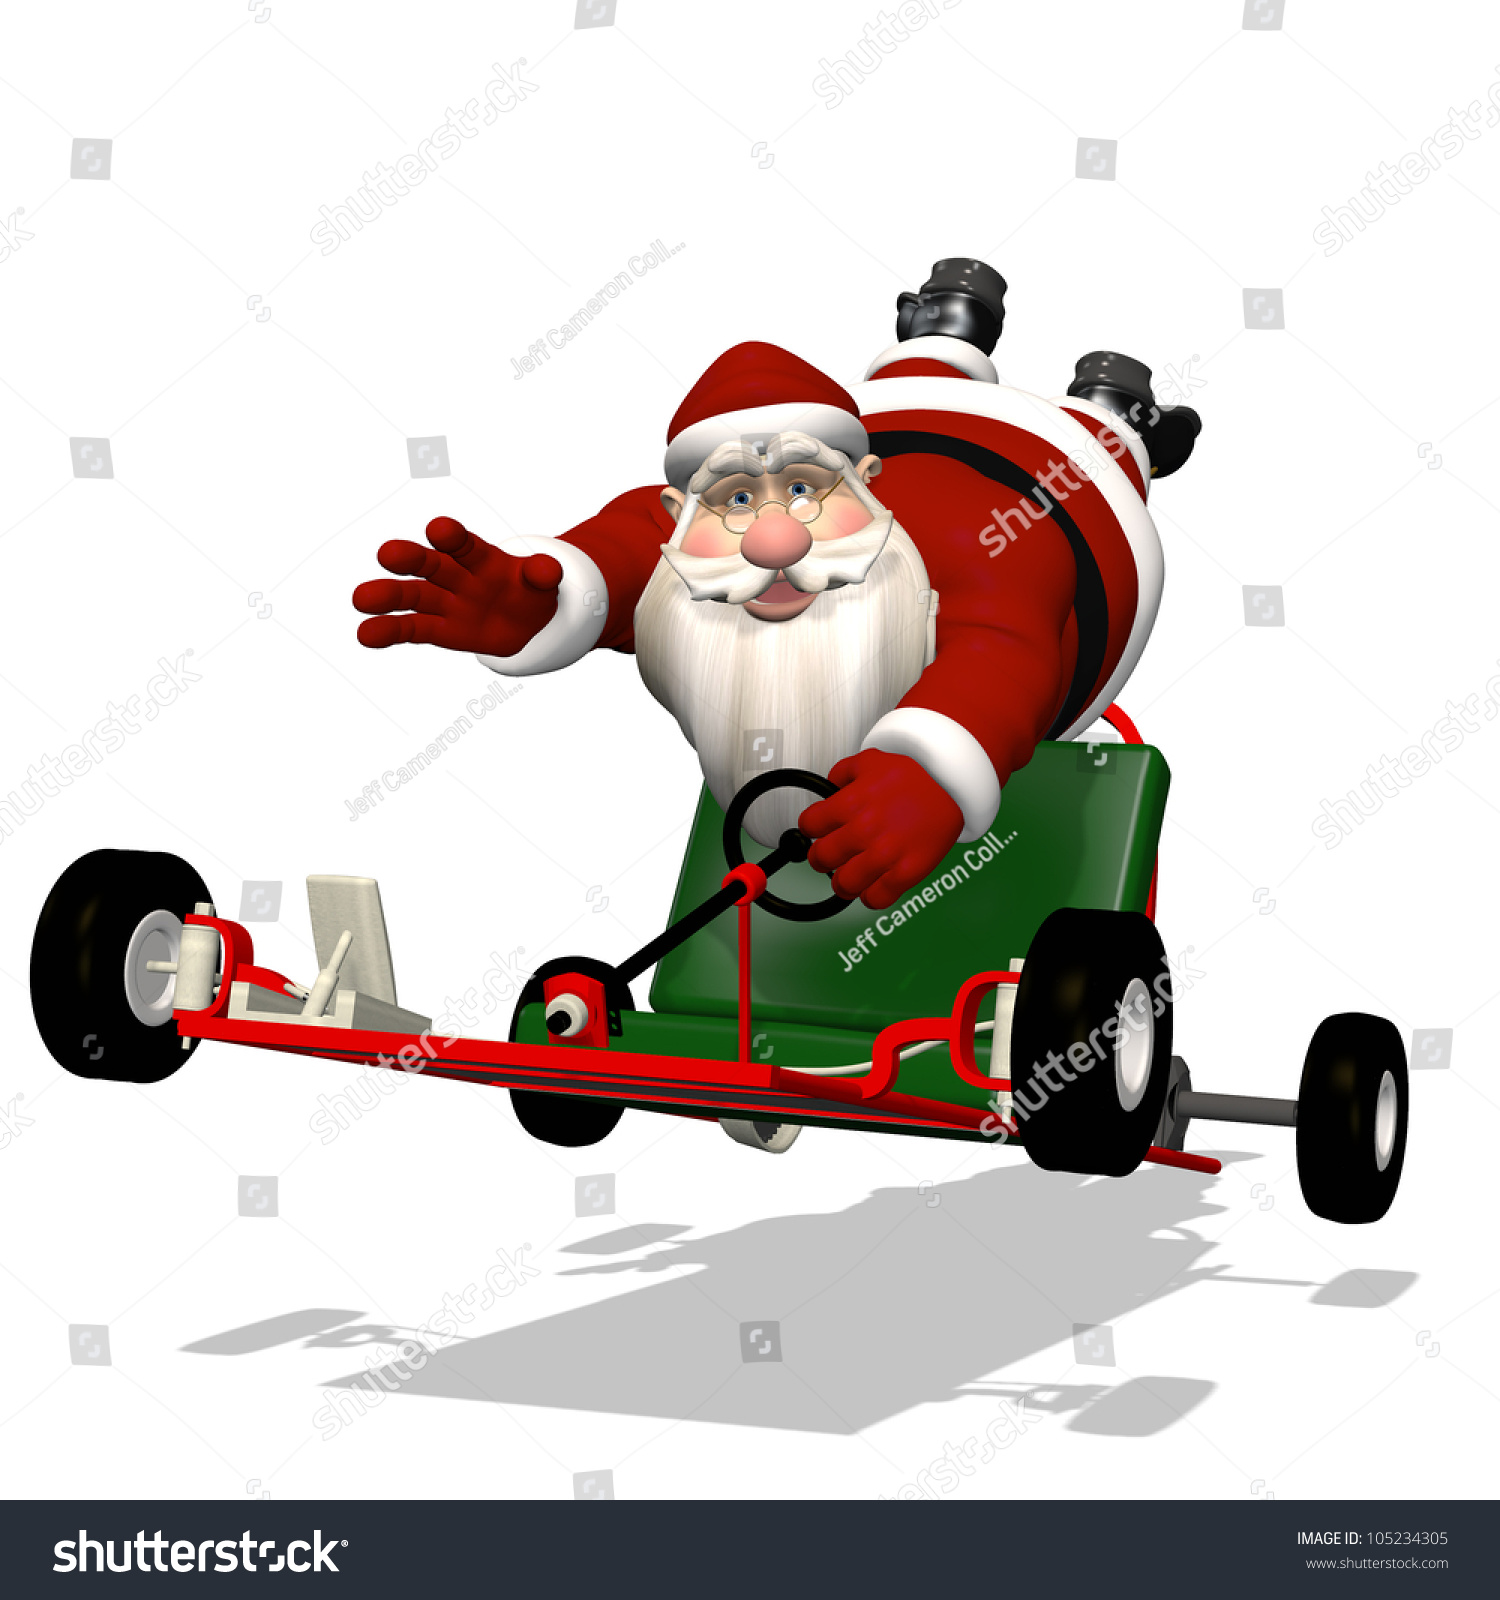 Merry Christmas - L87 Speedway - Lone Star Speedzone Forums